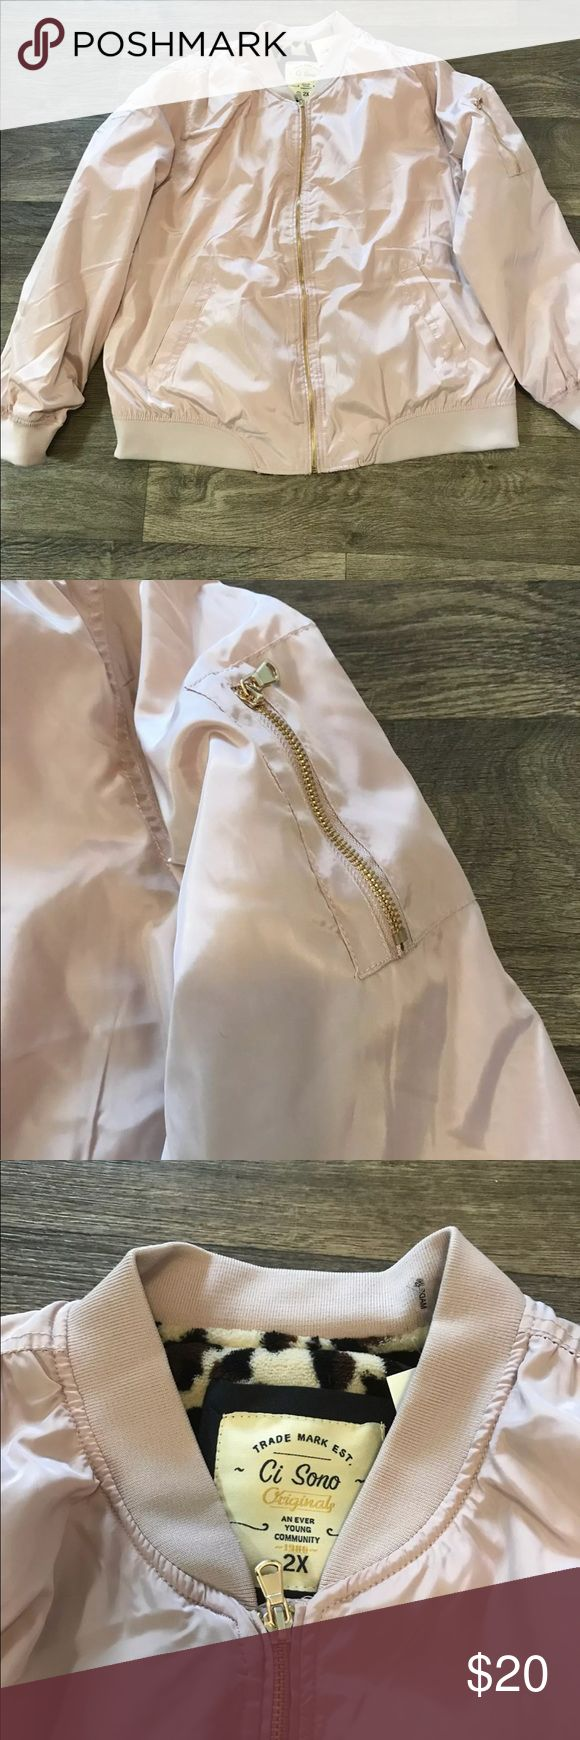 New light pink bomber jacket New and never been worn. Light pink bomber jacket with cheetah print inside. Super soft lining inside. Zipper on side. CUTE!!!! Jackets & Coats